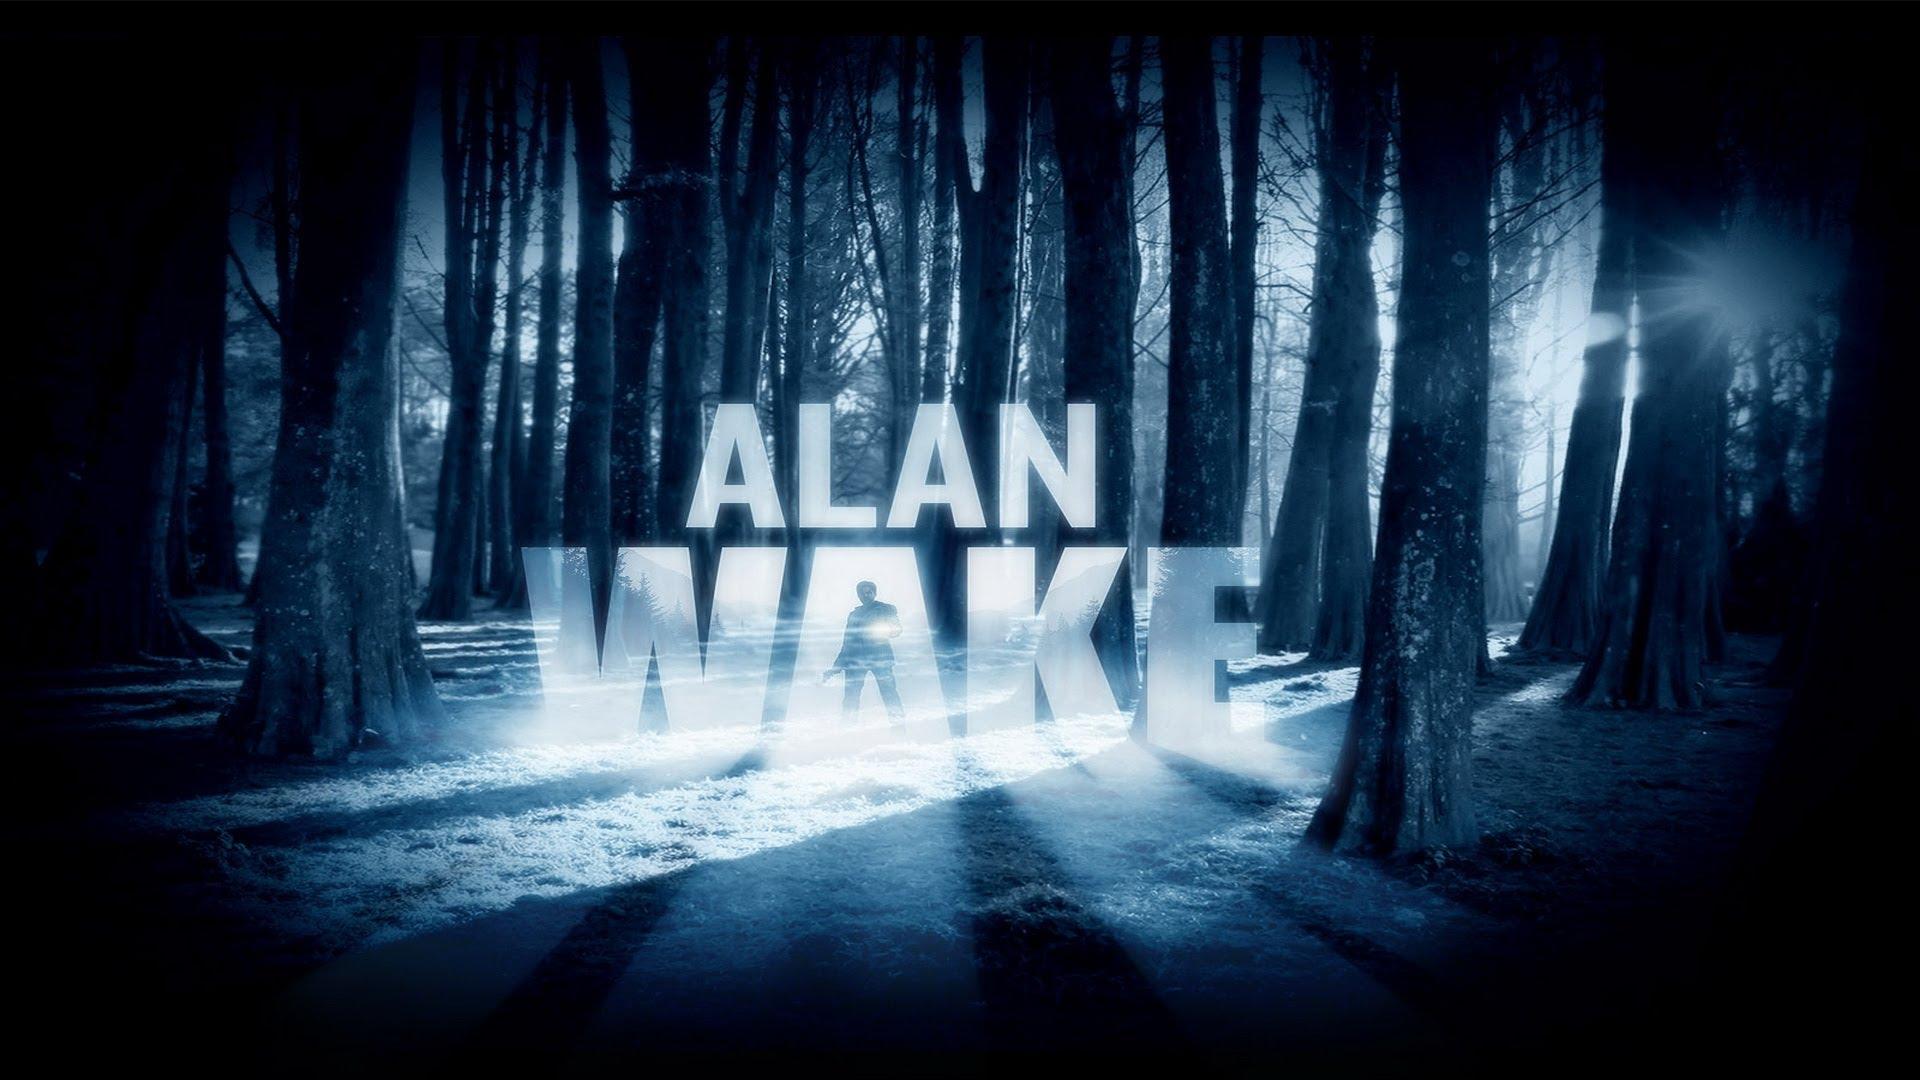 1920x1080 > Alan Wake Wallpapers